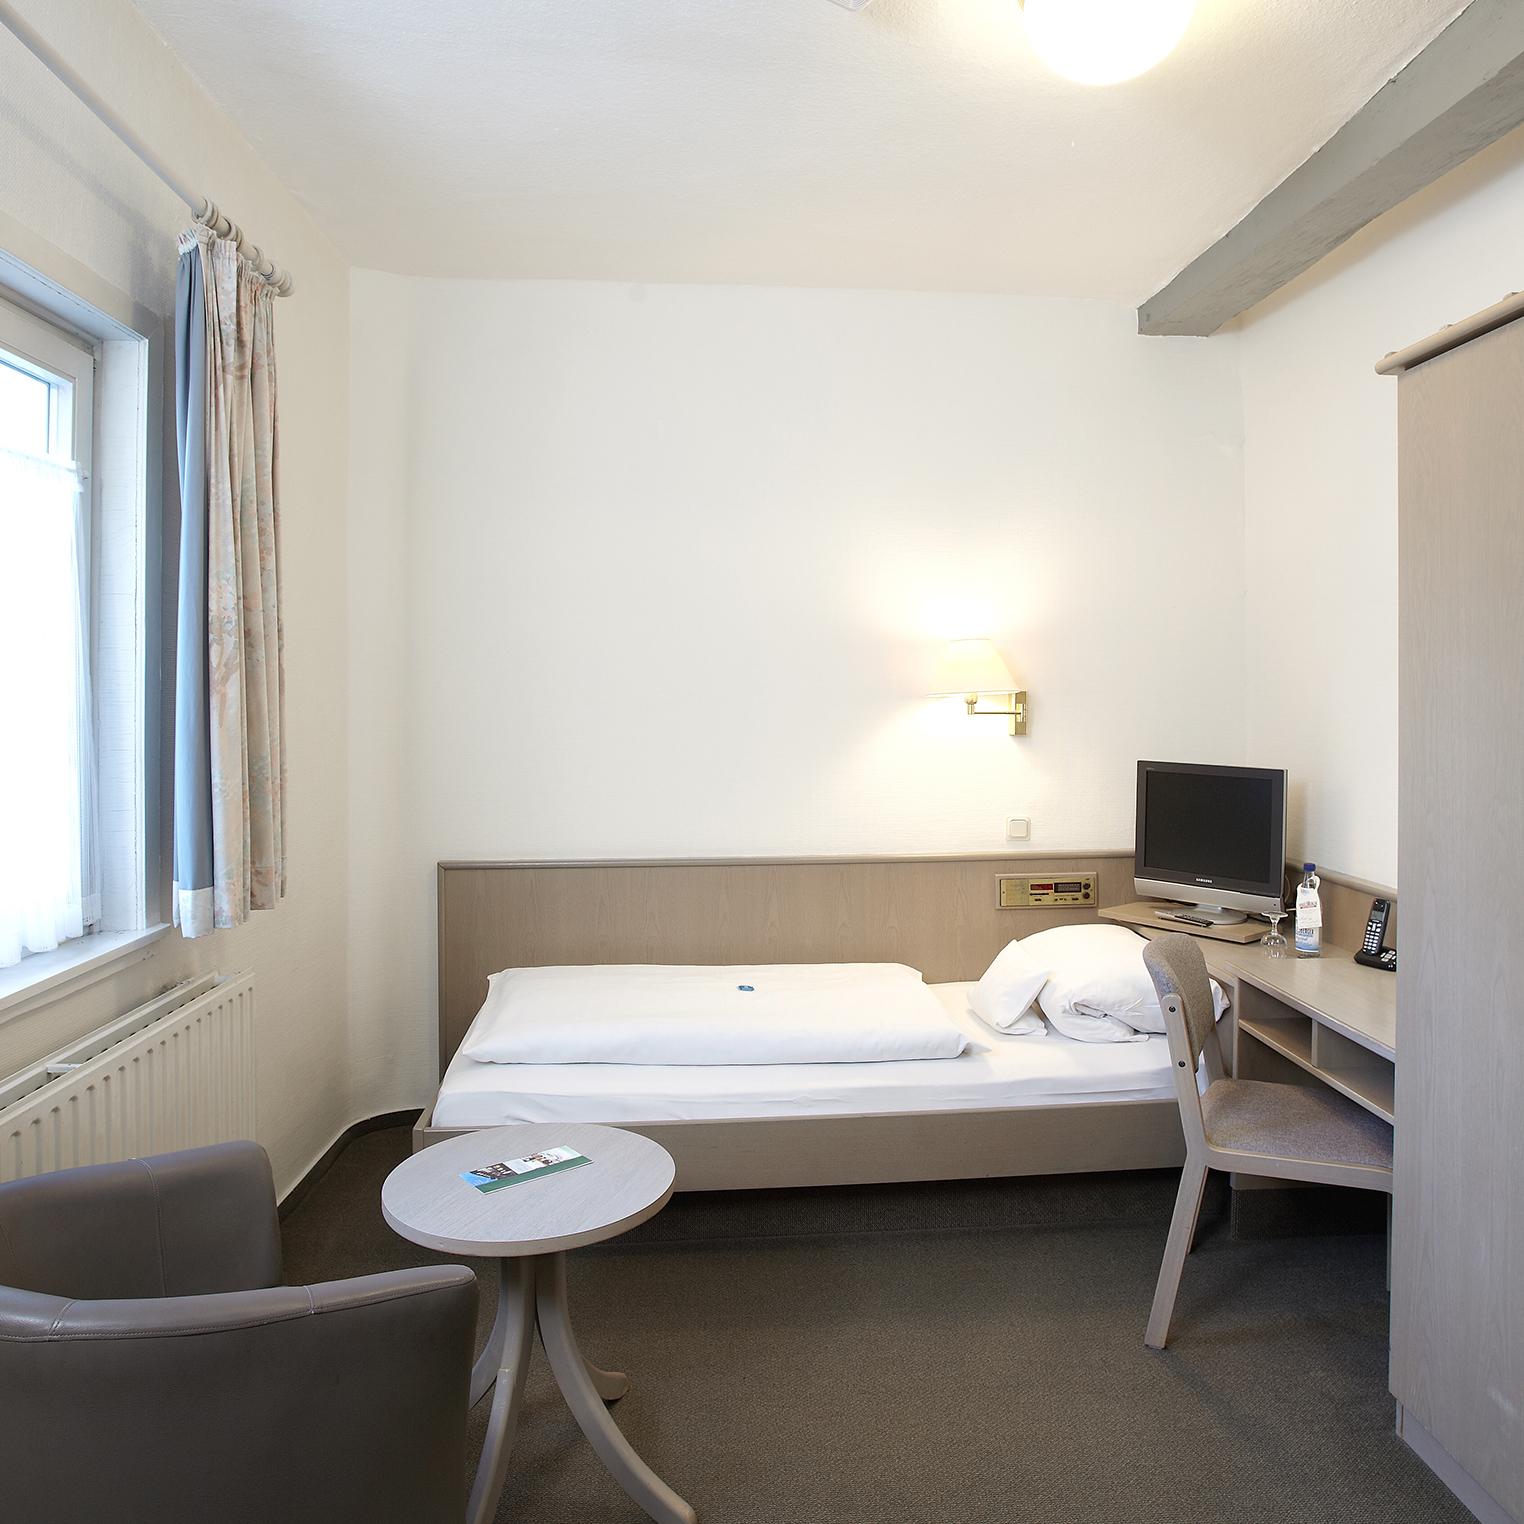 Hotel-Klingelhöffer-050115 17191_web